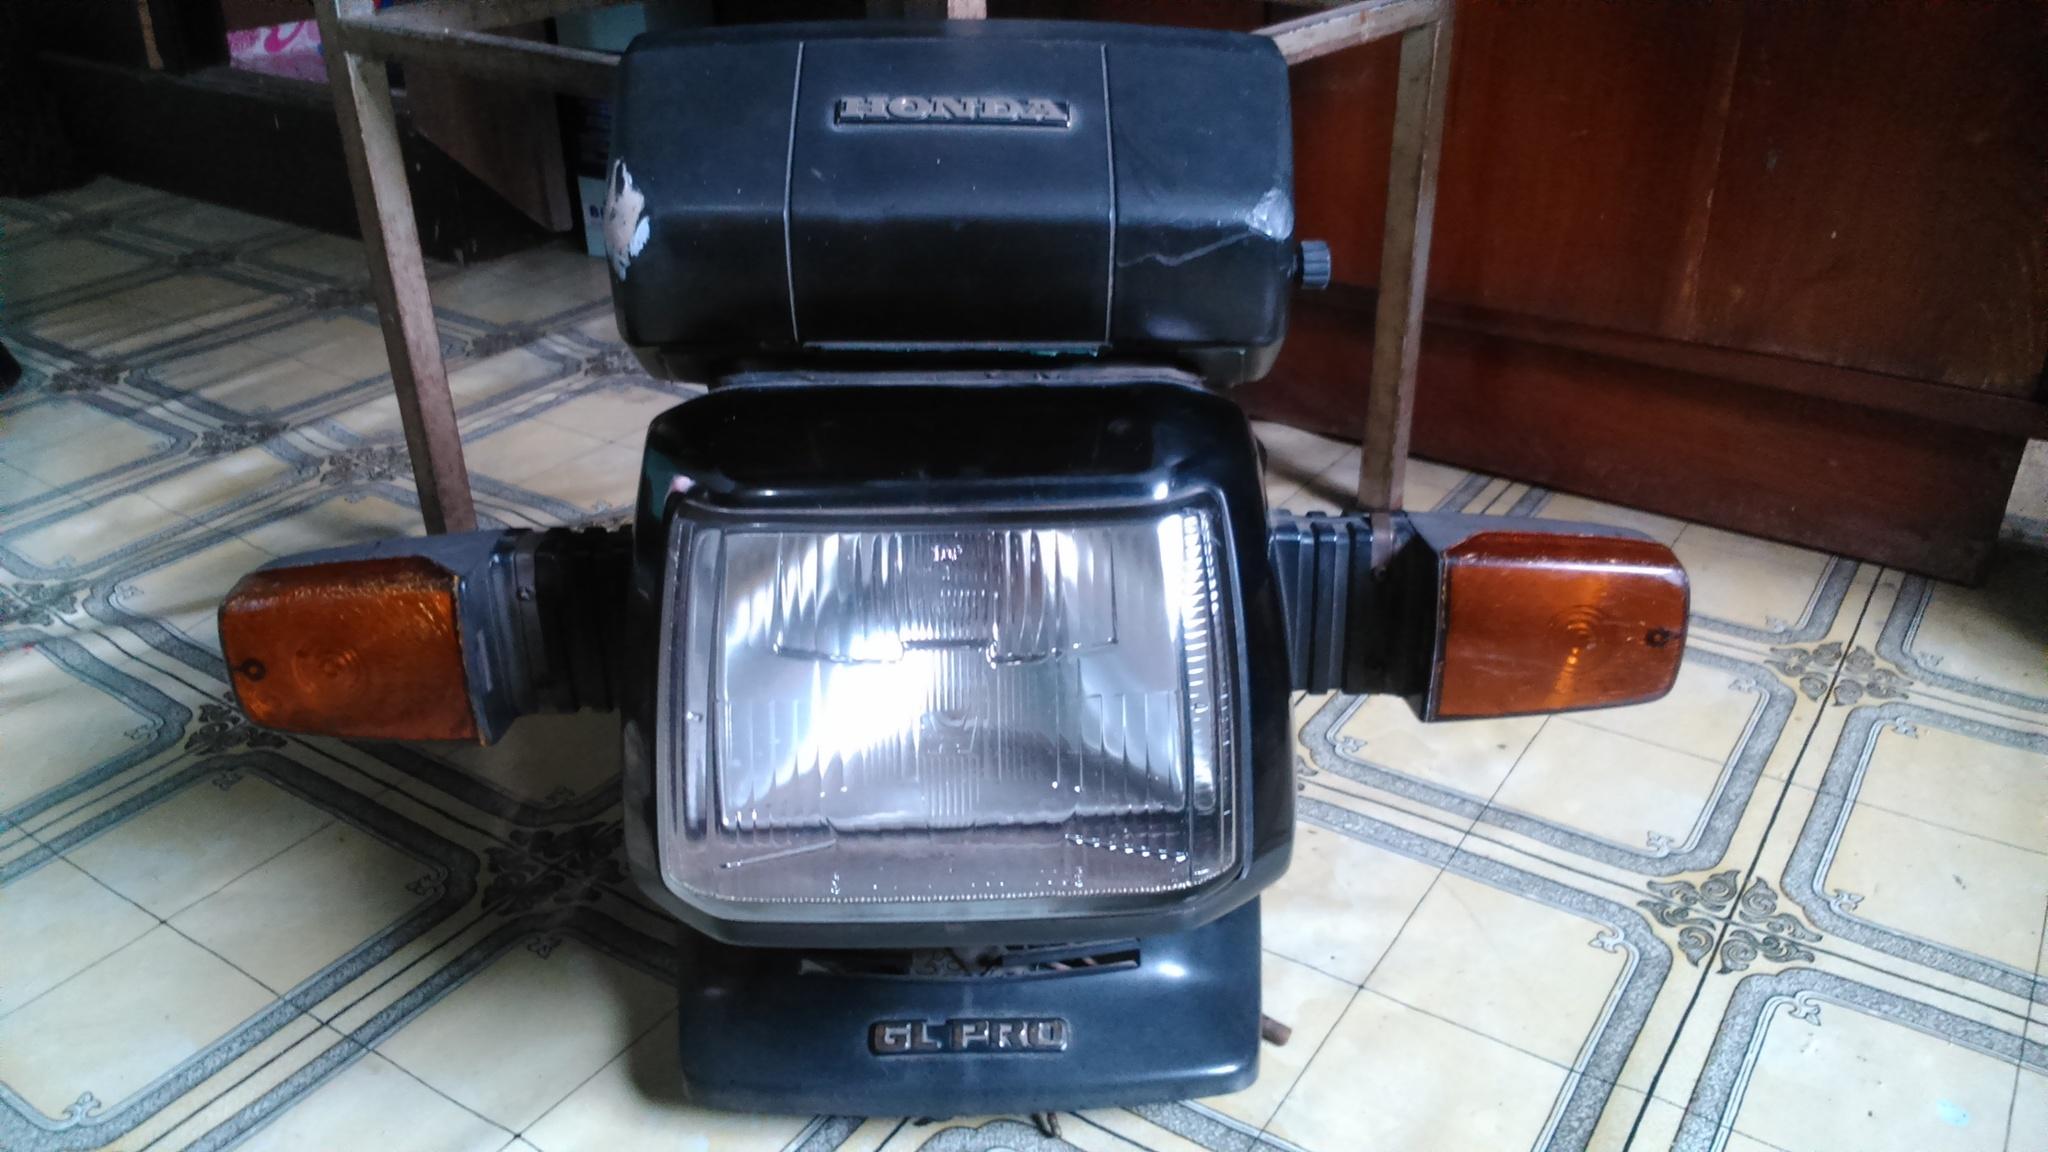 jual headlamp lampu depan full set honda gl pro neotech - majid